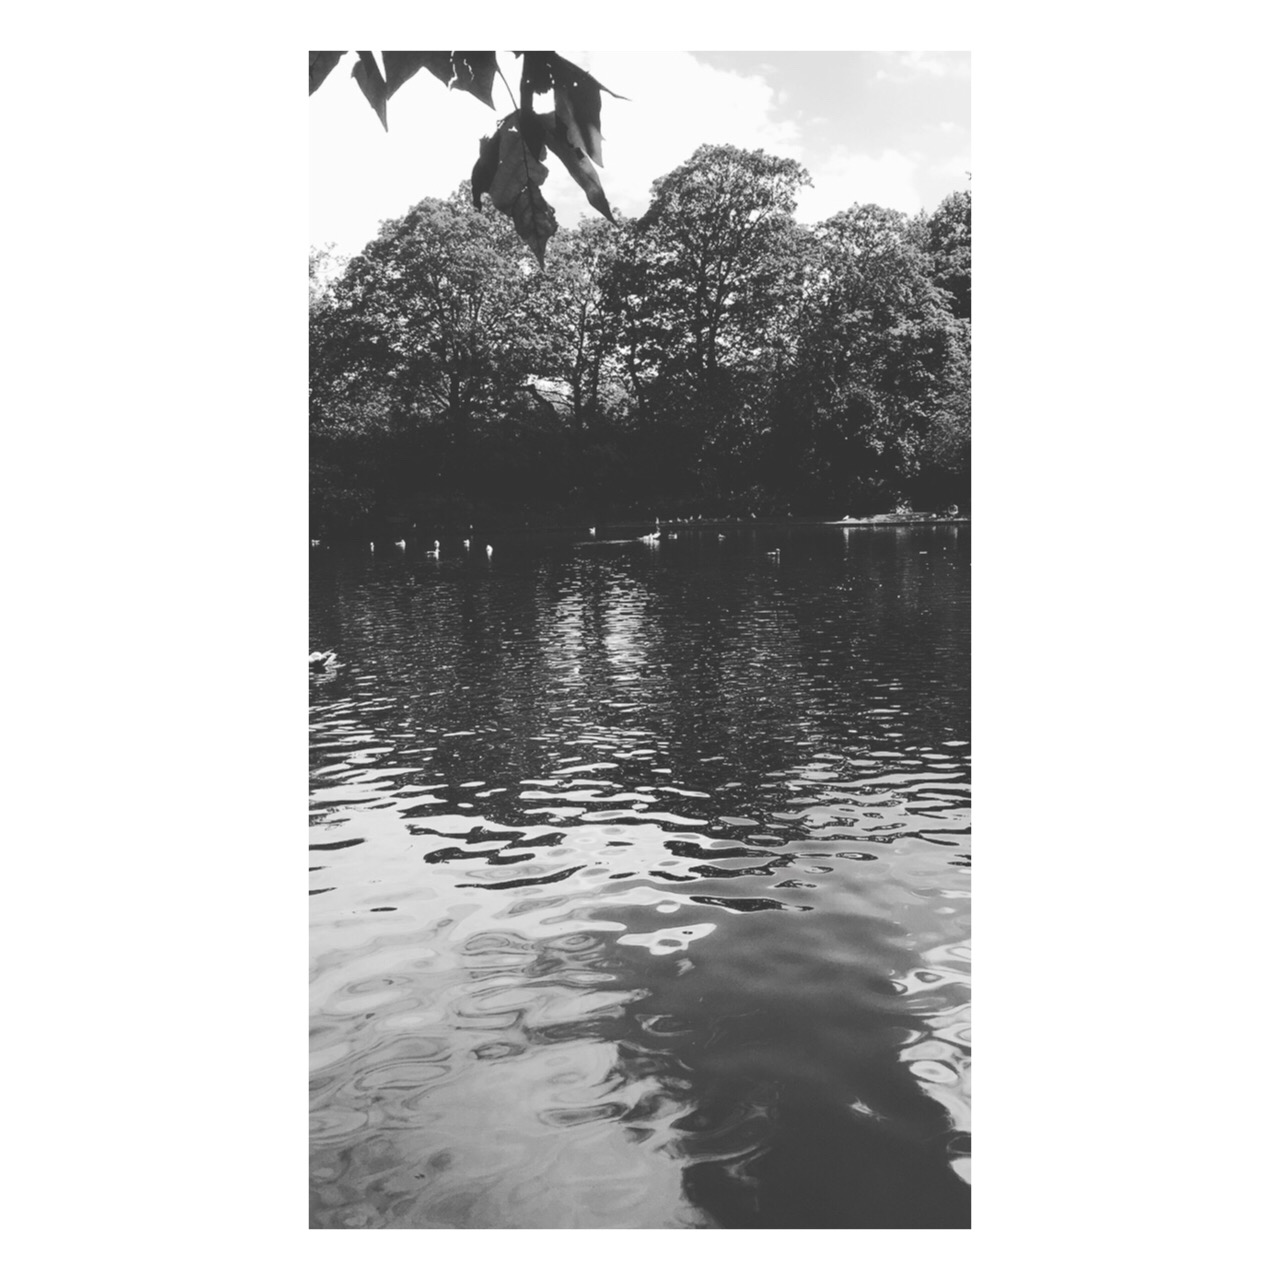 Photo 04-09-2017, 22 23 32.jpg